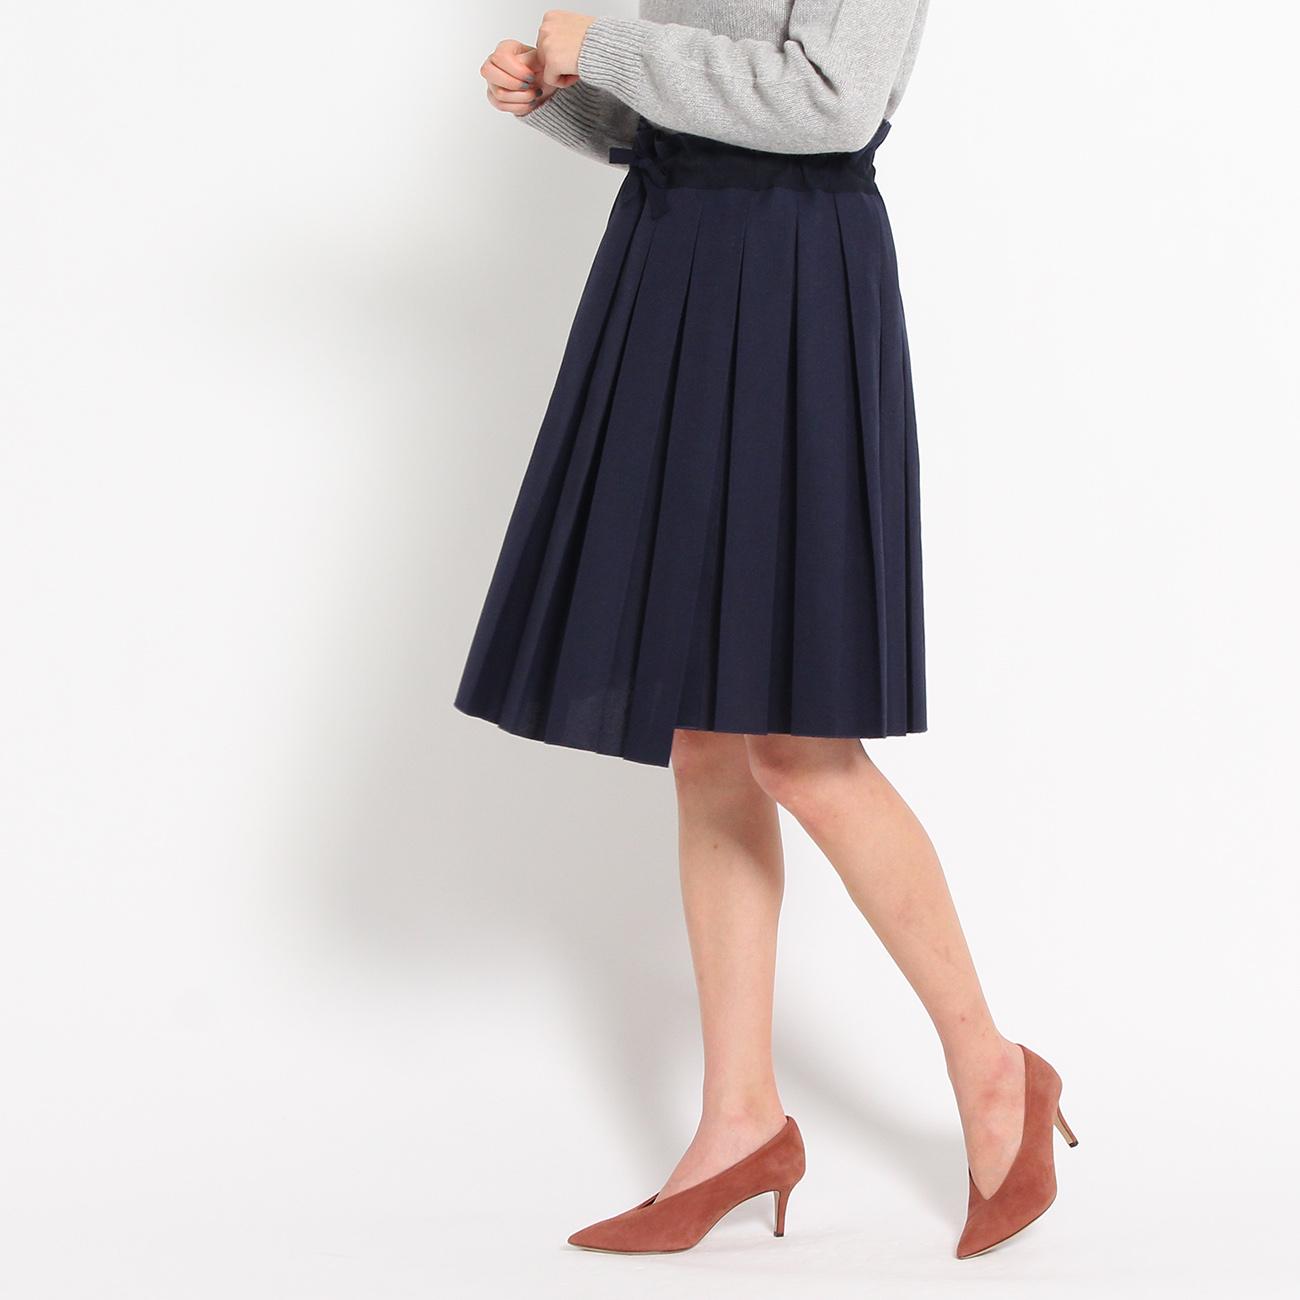 【DRESSTERIOR (ドレステリア レディースバイイング)】SOFIE D'HOORE イレギュラーヘムプリーツスカートレディース スカート|ひざ丈 ネイビー